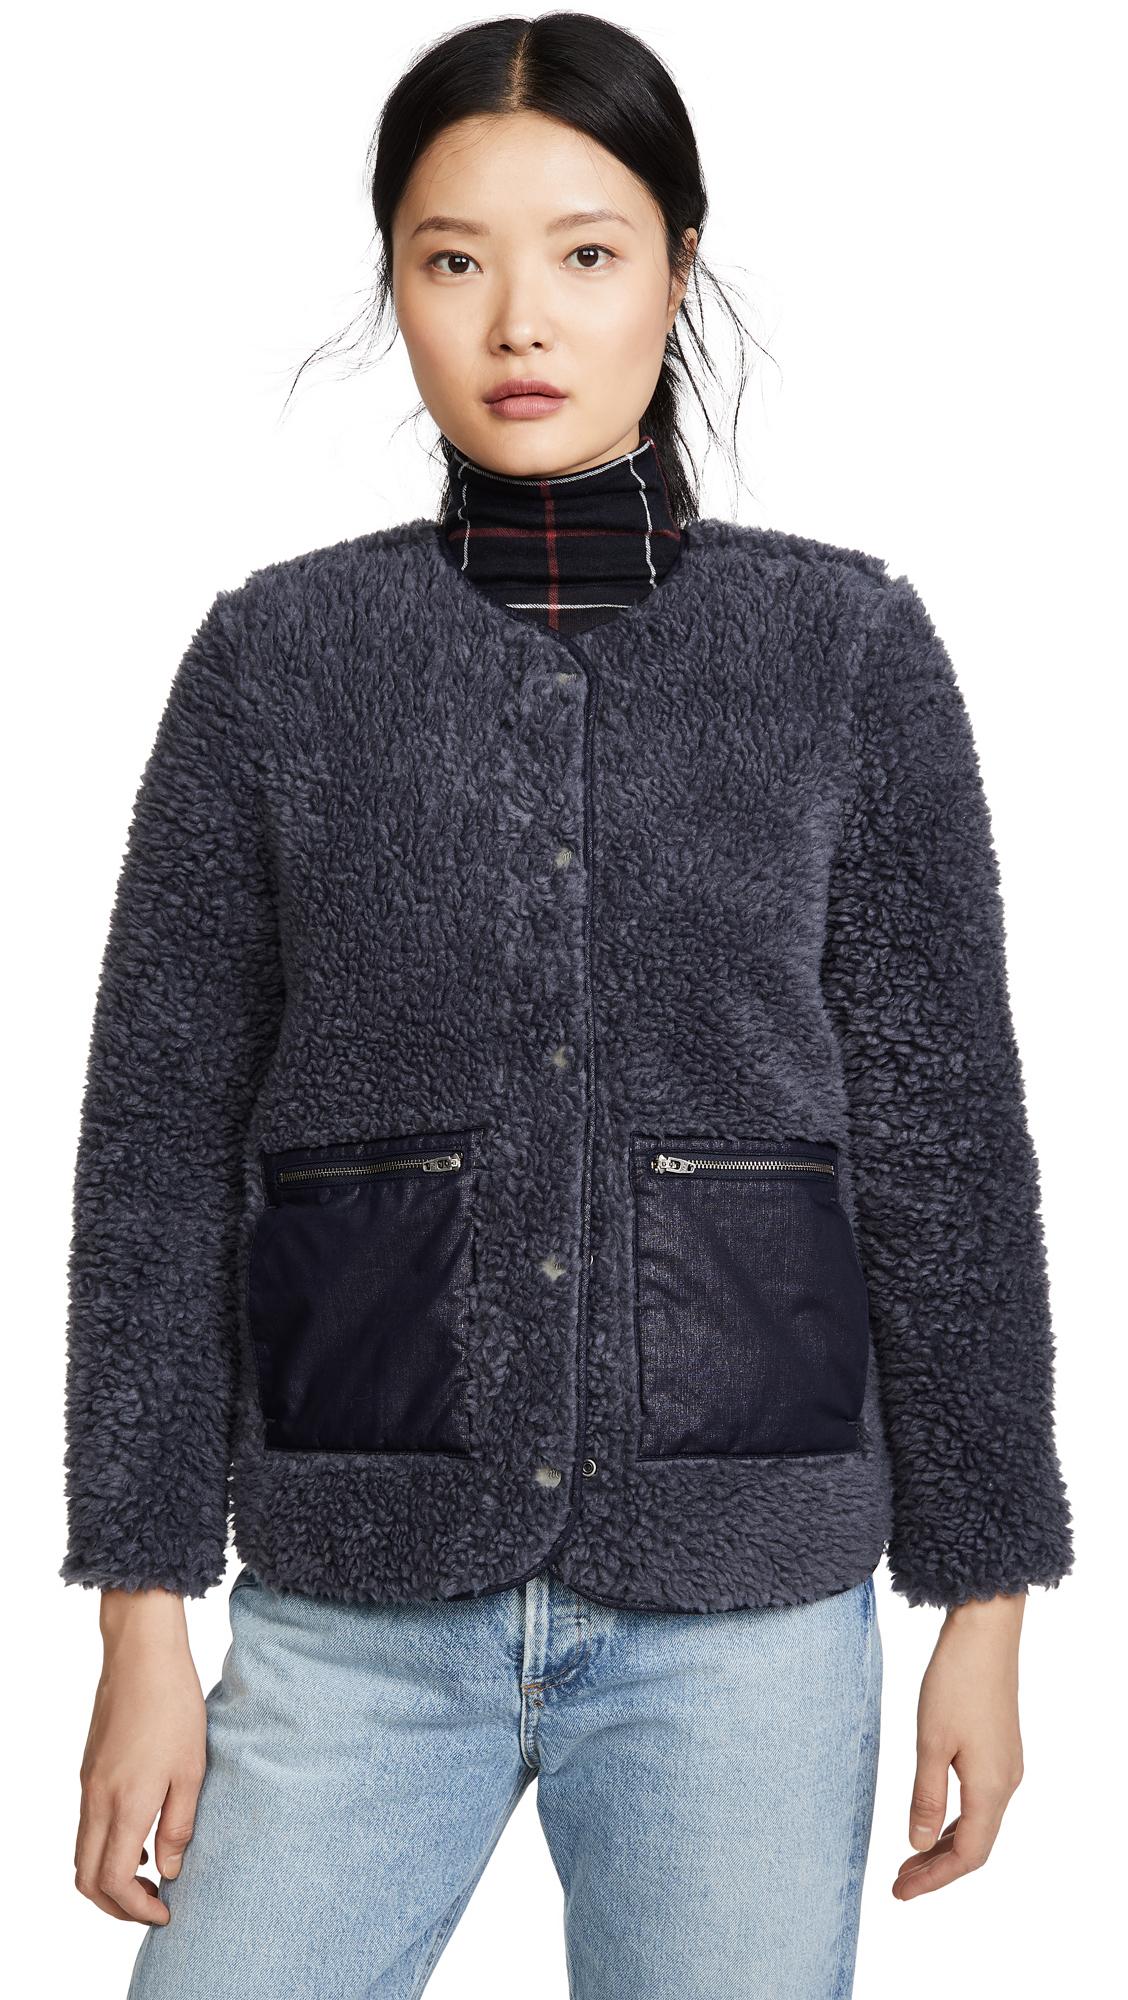 Buy Madewell Blue Sherpa Jacket online beautiful Madewell Jackets, Coats, Down Jackets